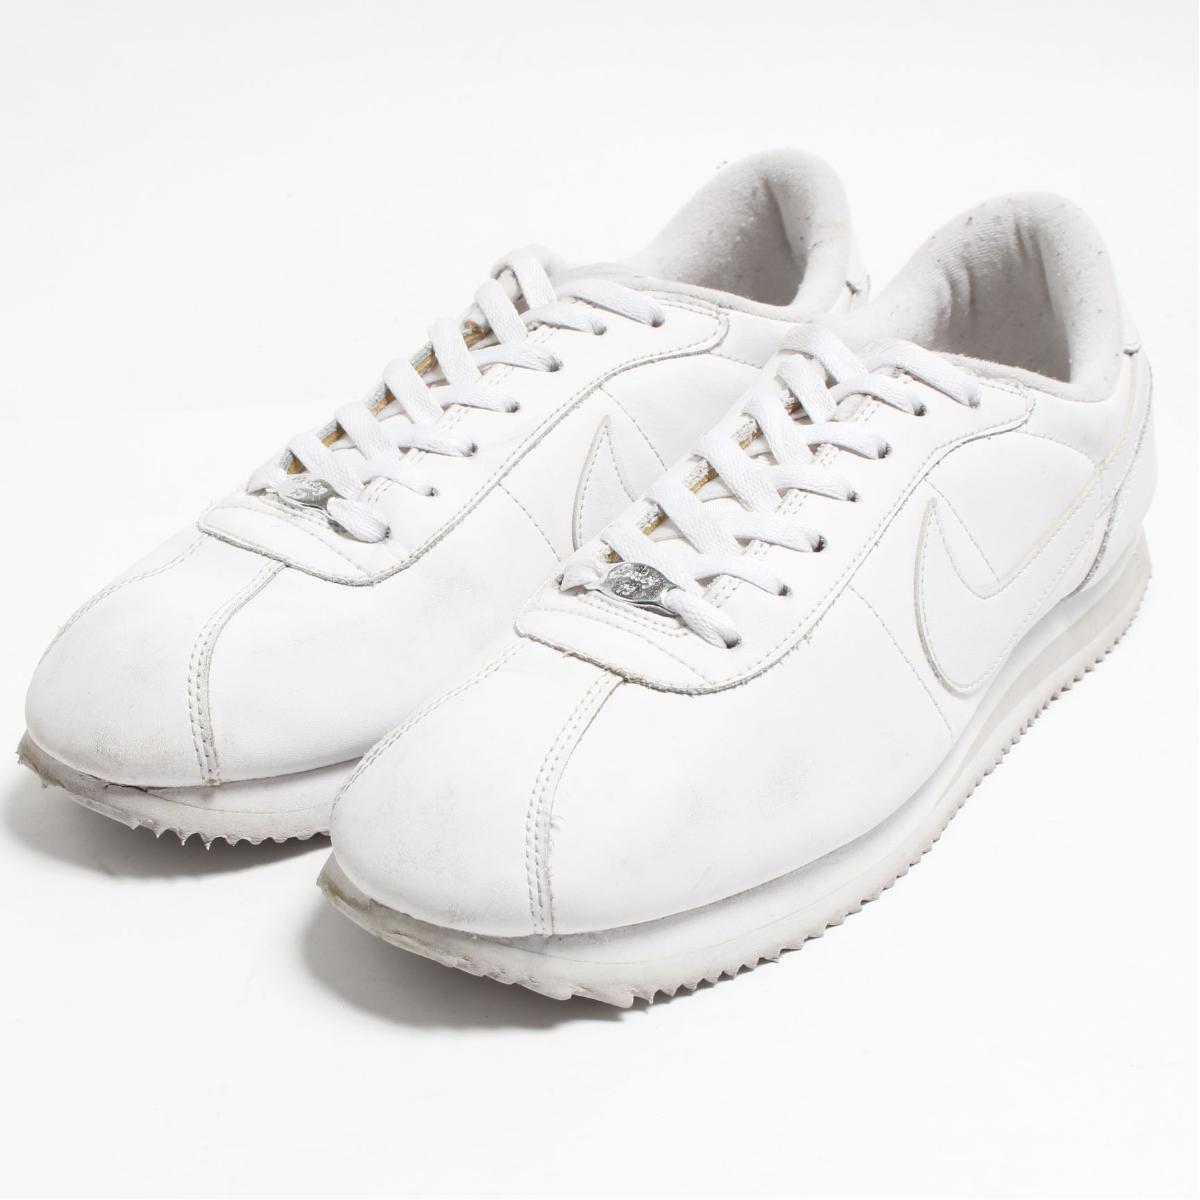 size 40 cc2ec ea026 Nike NIKE CORTEZ BASIC LEATHER 06 sneakers US11 men 29.0cm  bon8454 ...